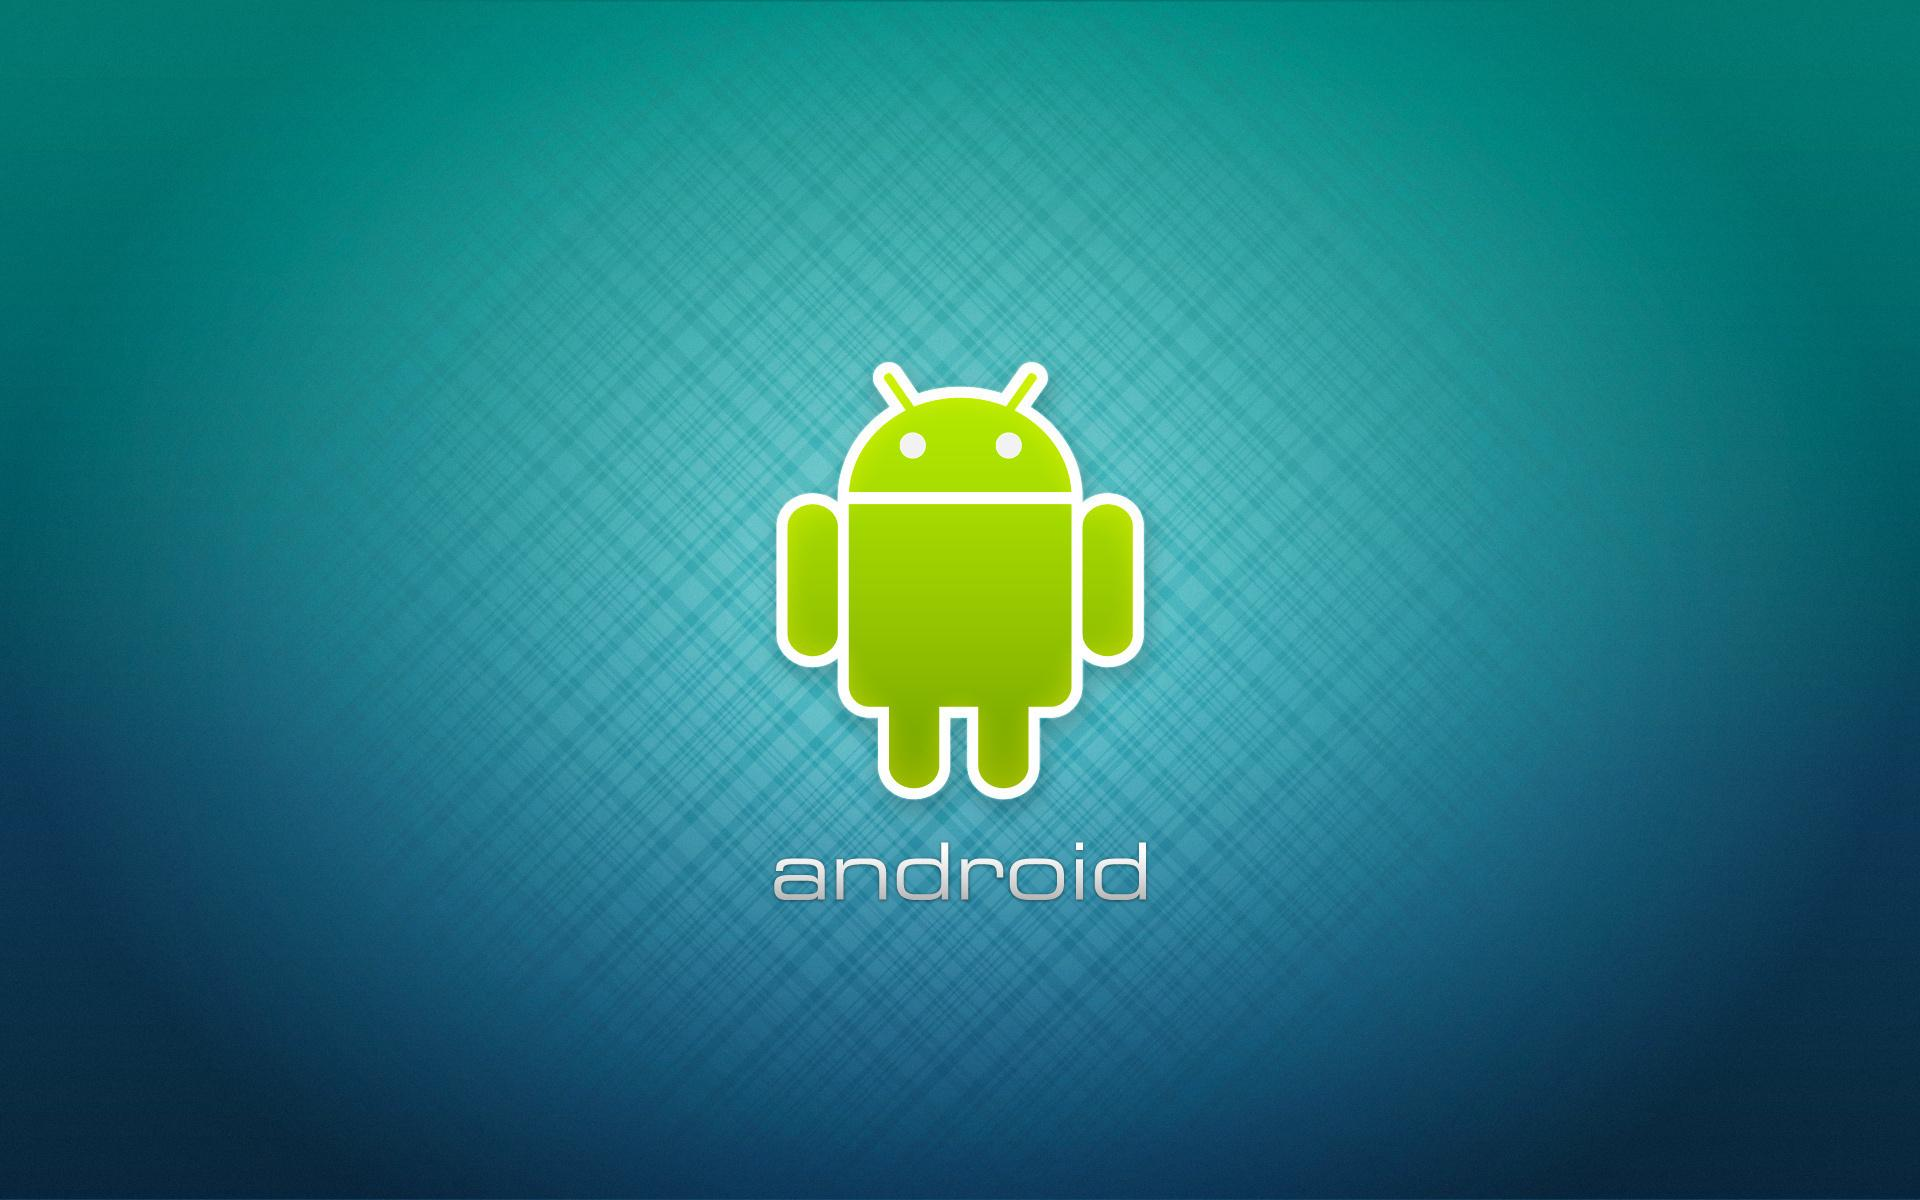 Какие бывают симуляторы андроида на ПК?